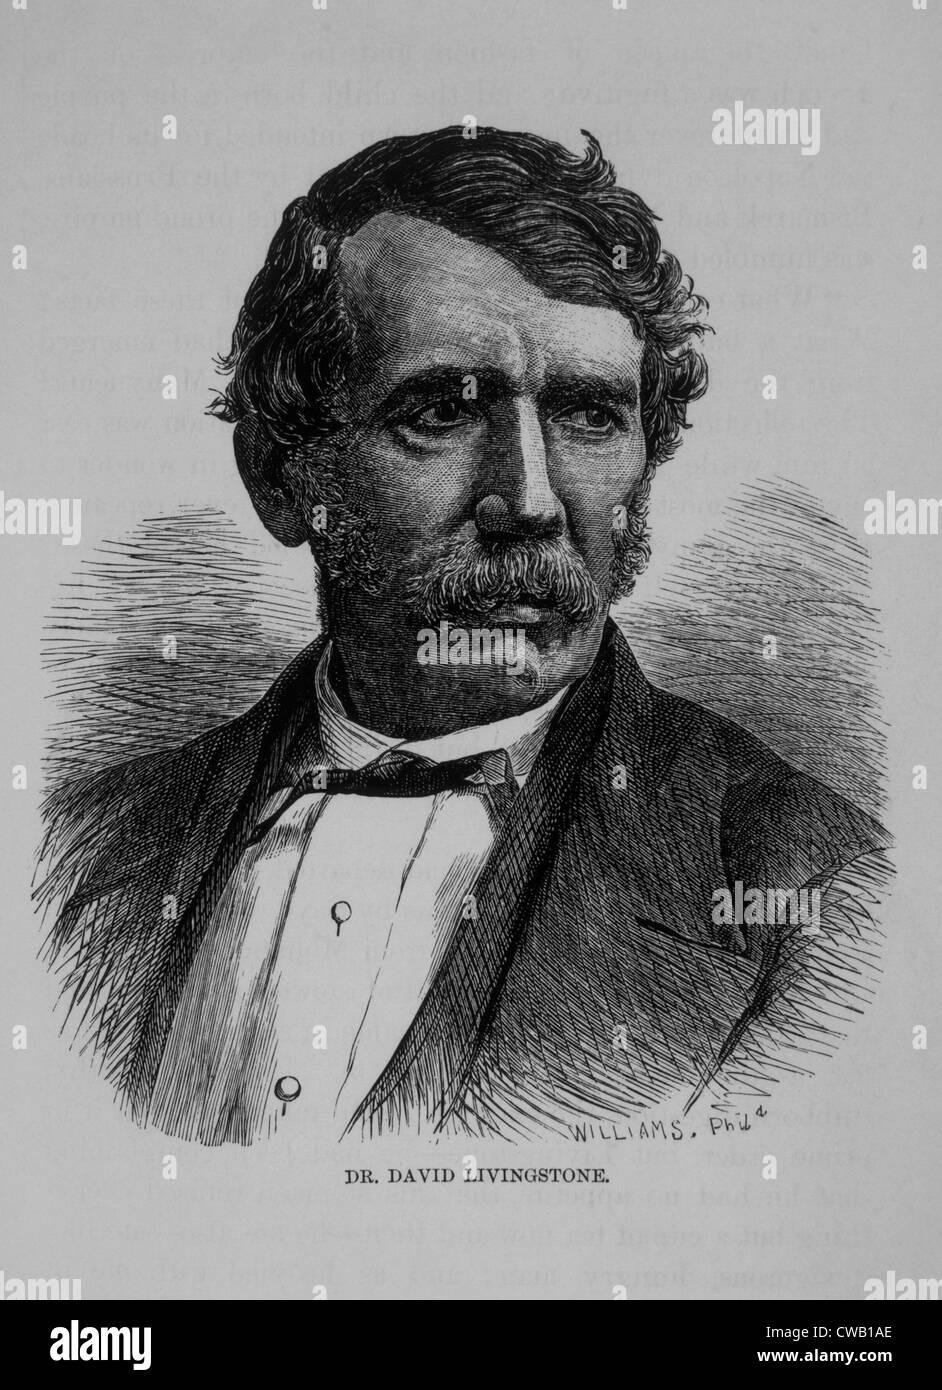 David Livingstone (1813-1873), engraving 1878 - Stock Image